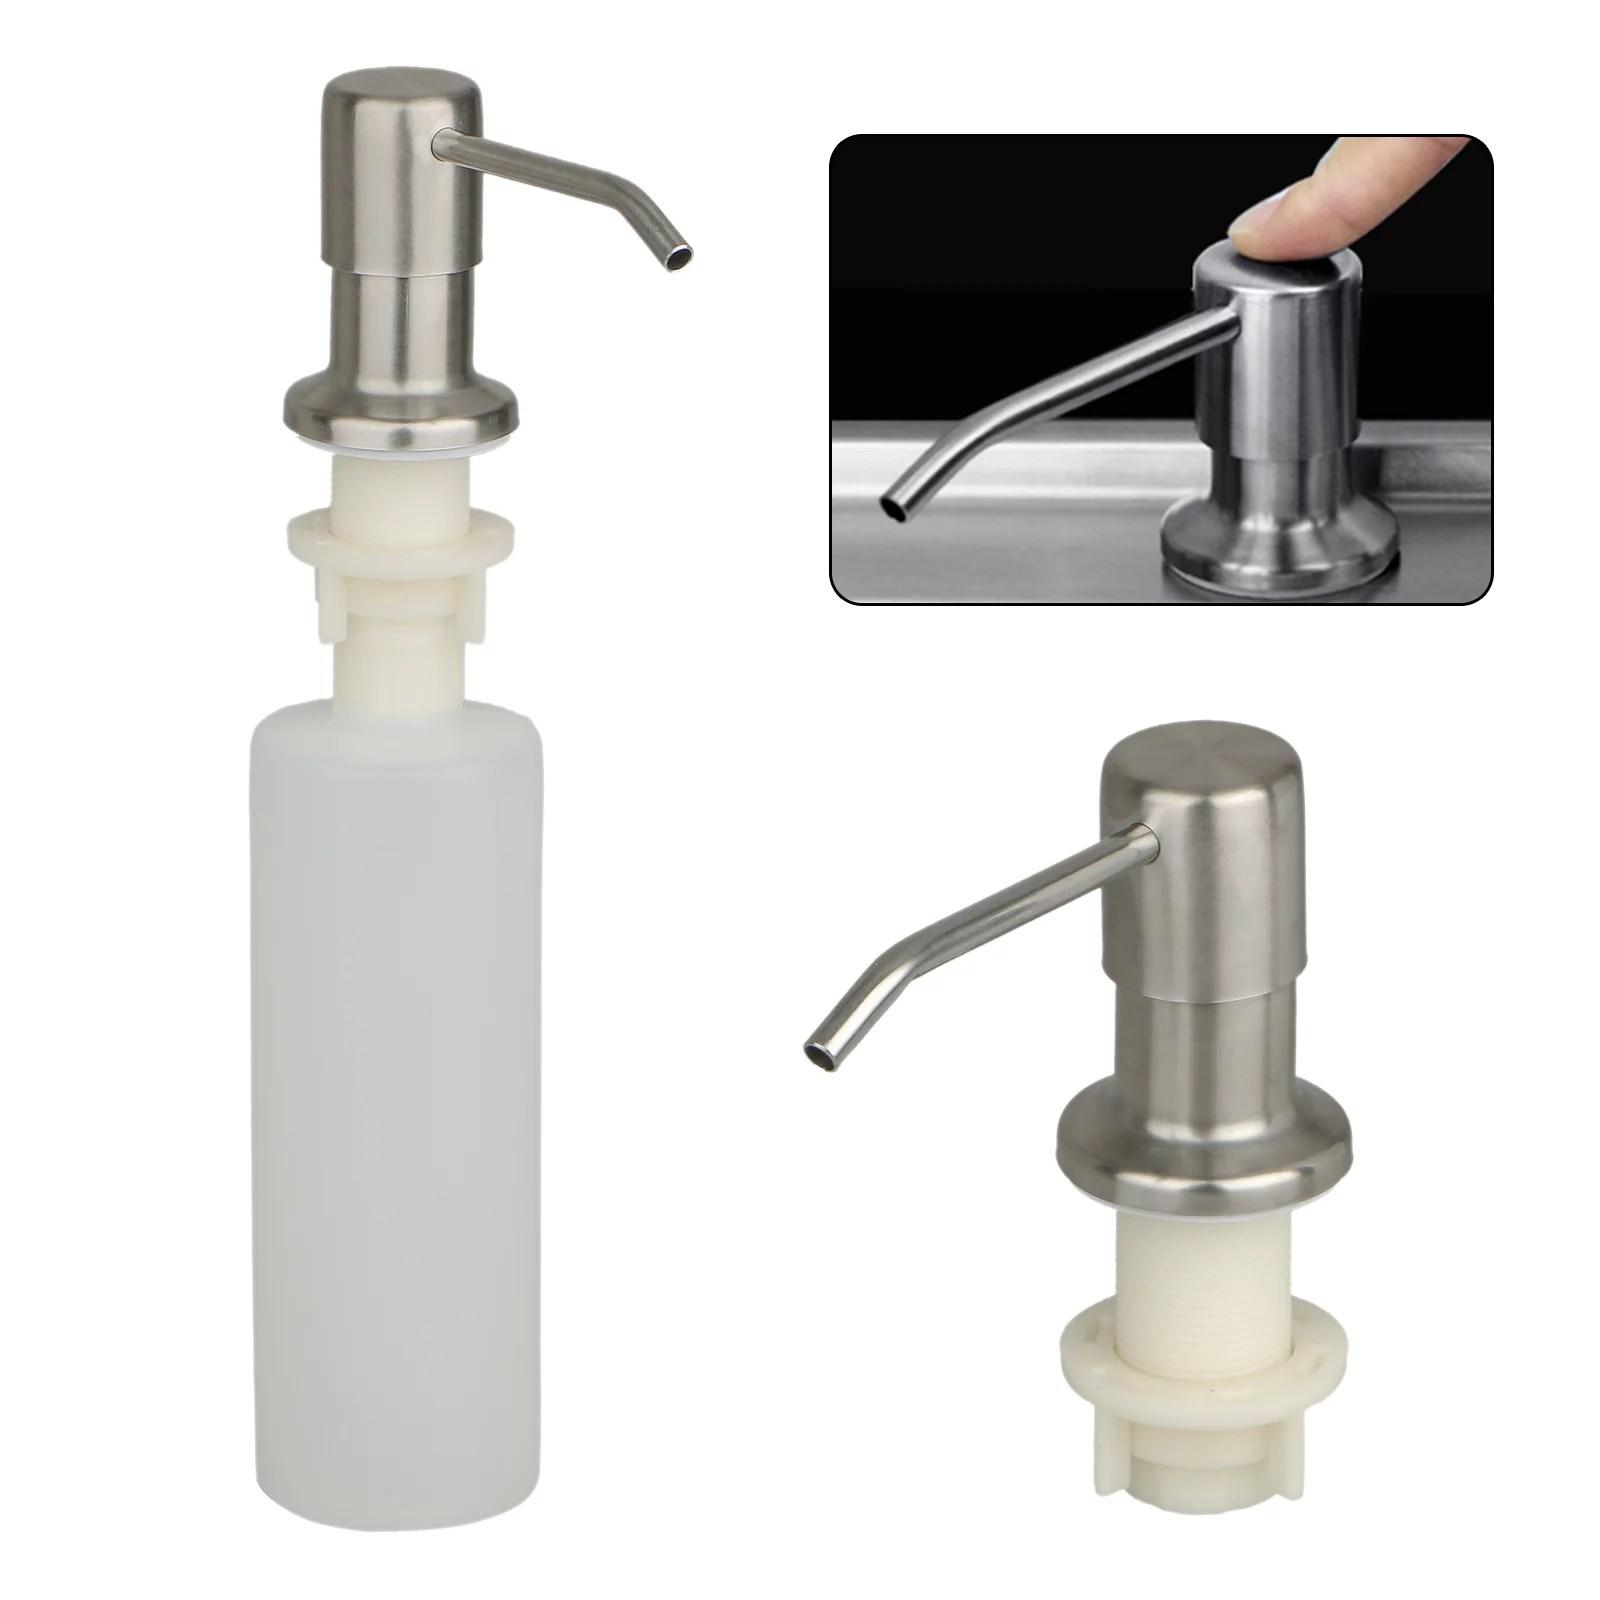 500ml sink soap dispenser stainless steel kitchen soap hand soap dispenser pump